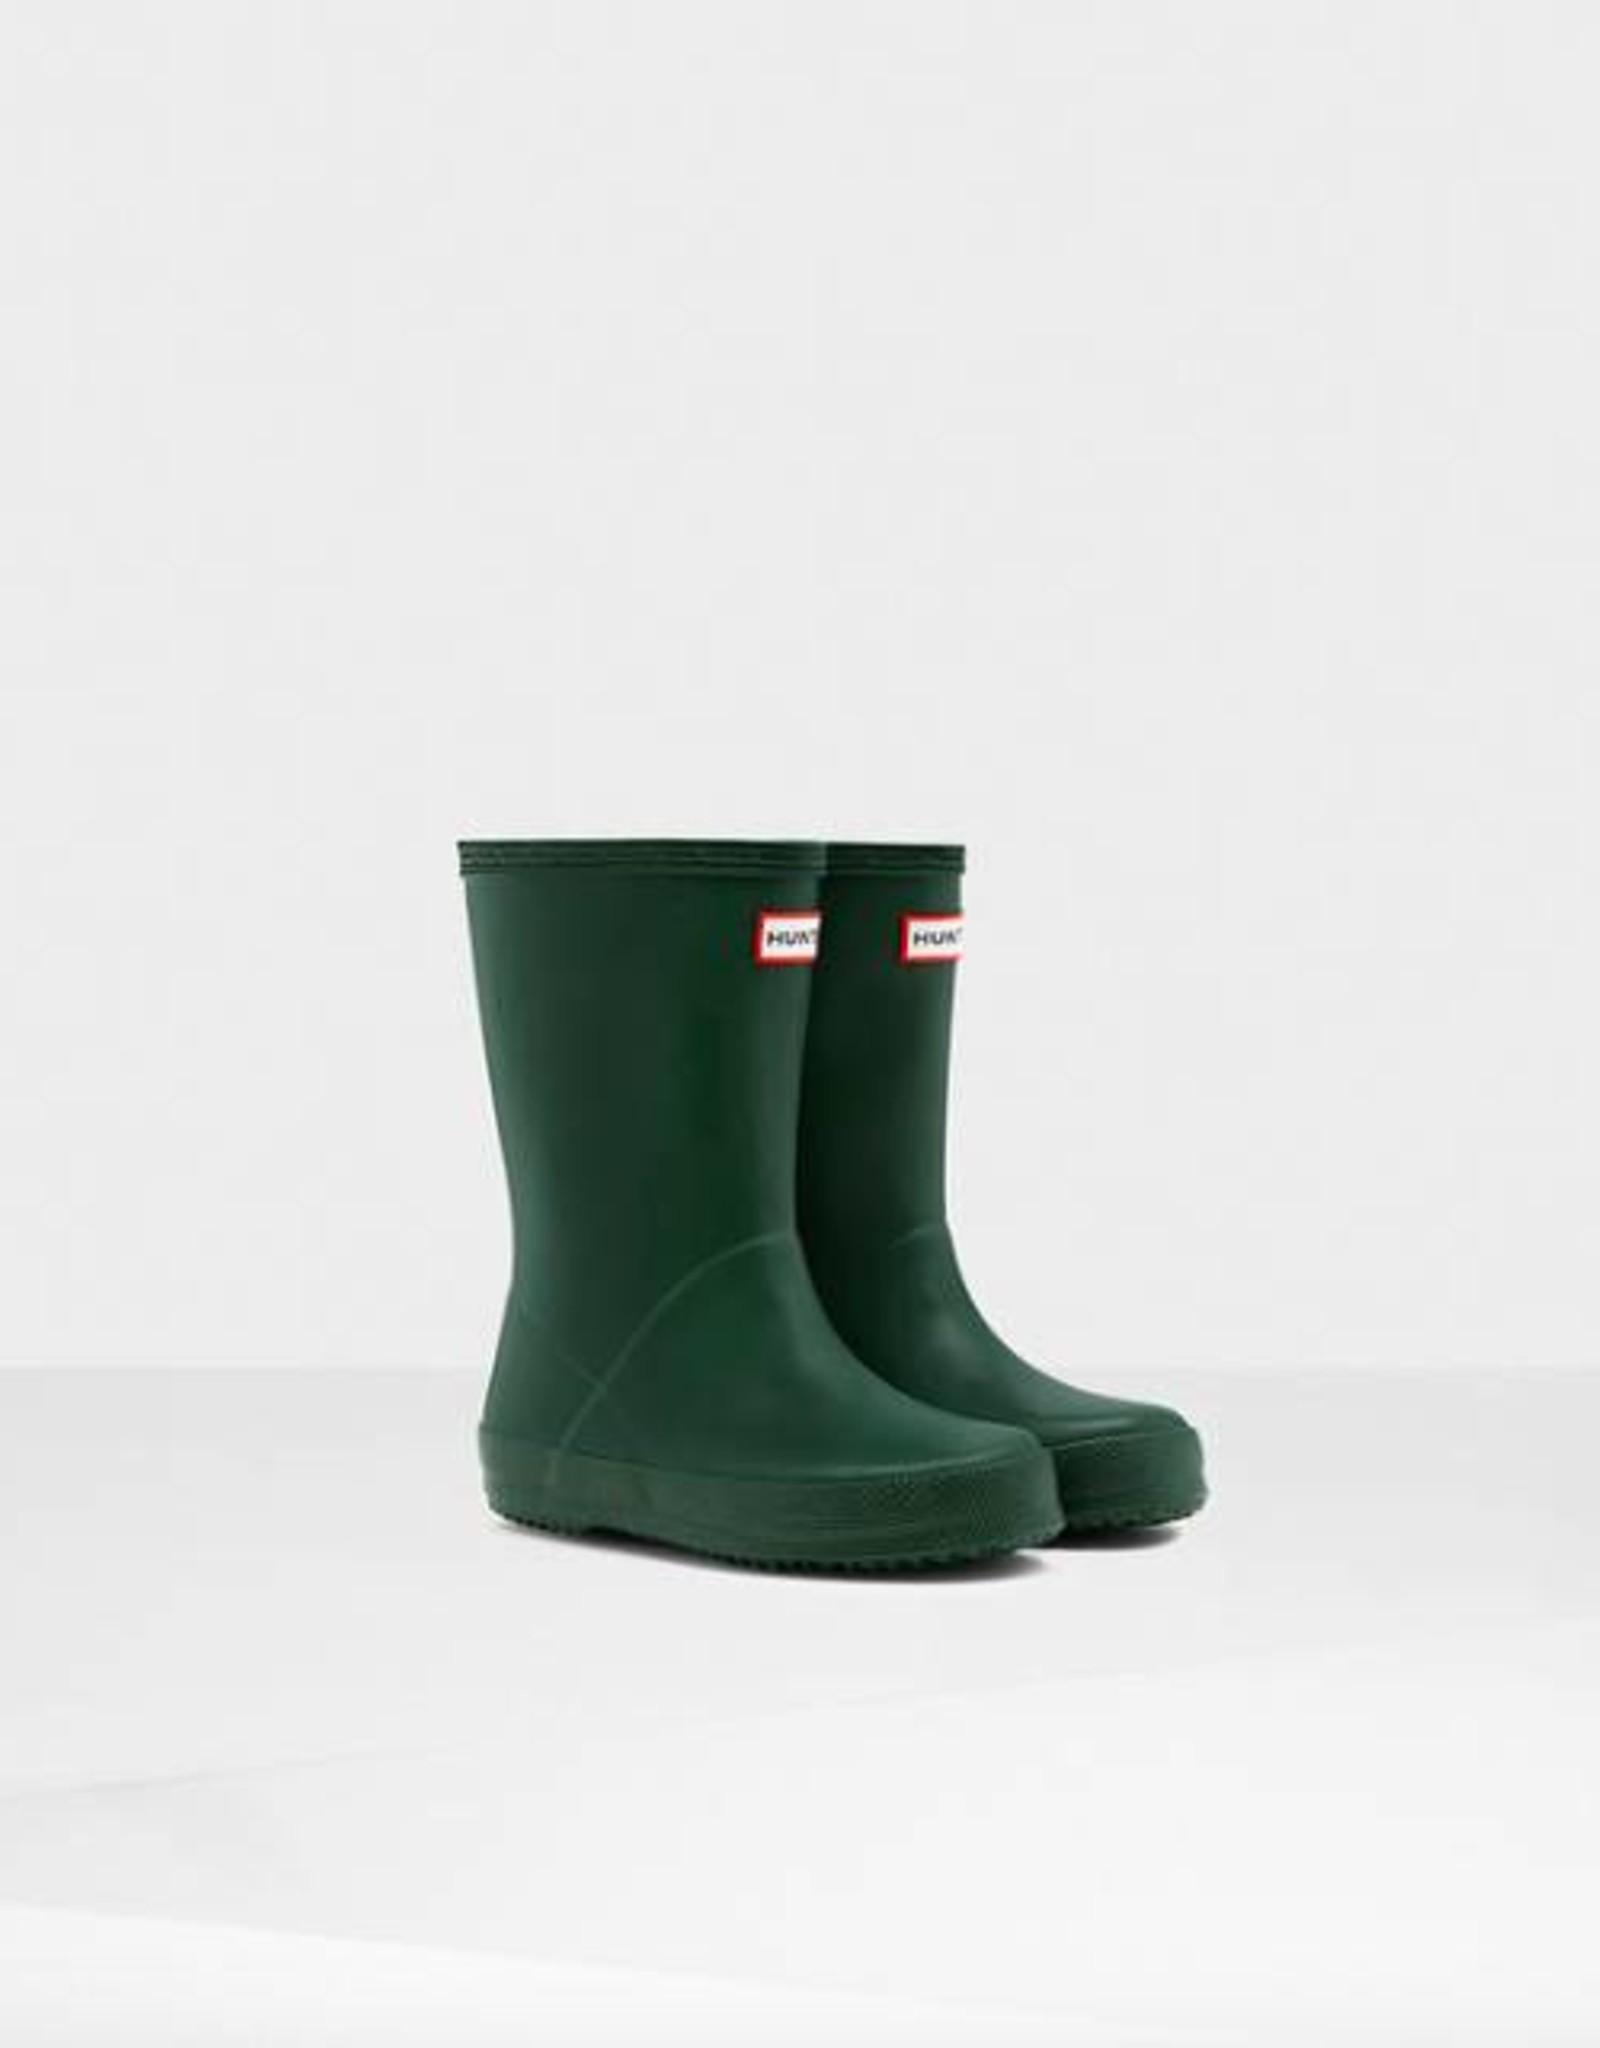 Original kids classic rain boots